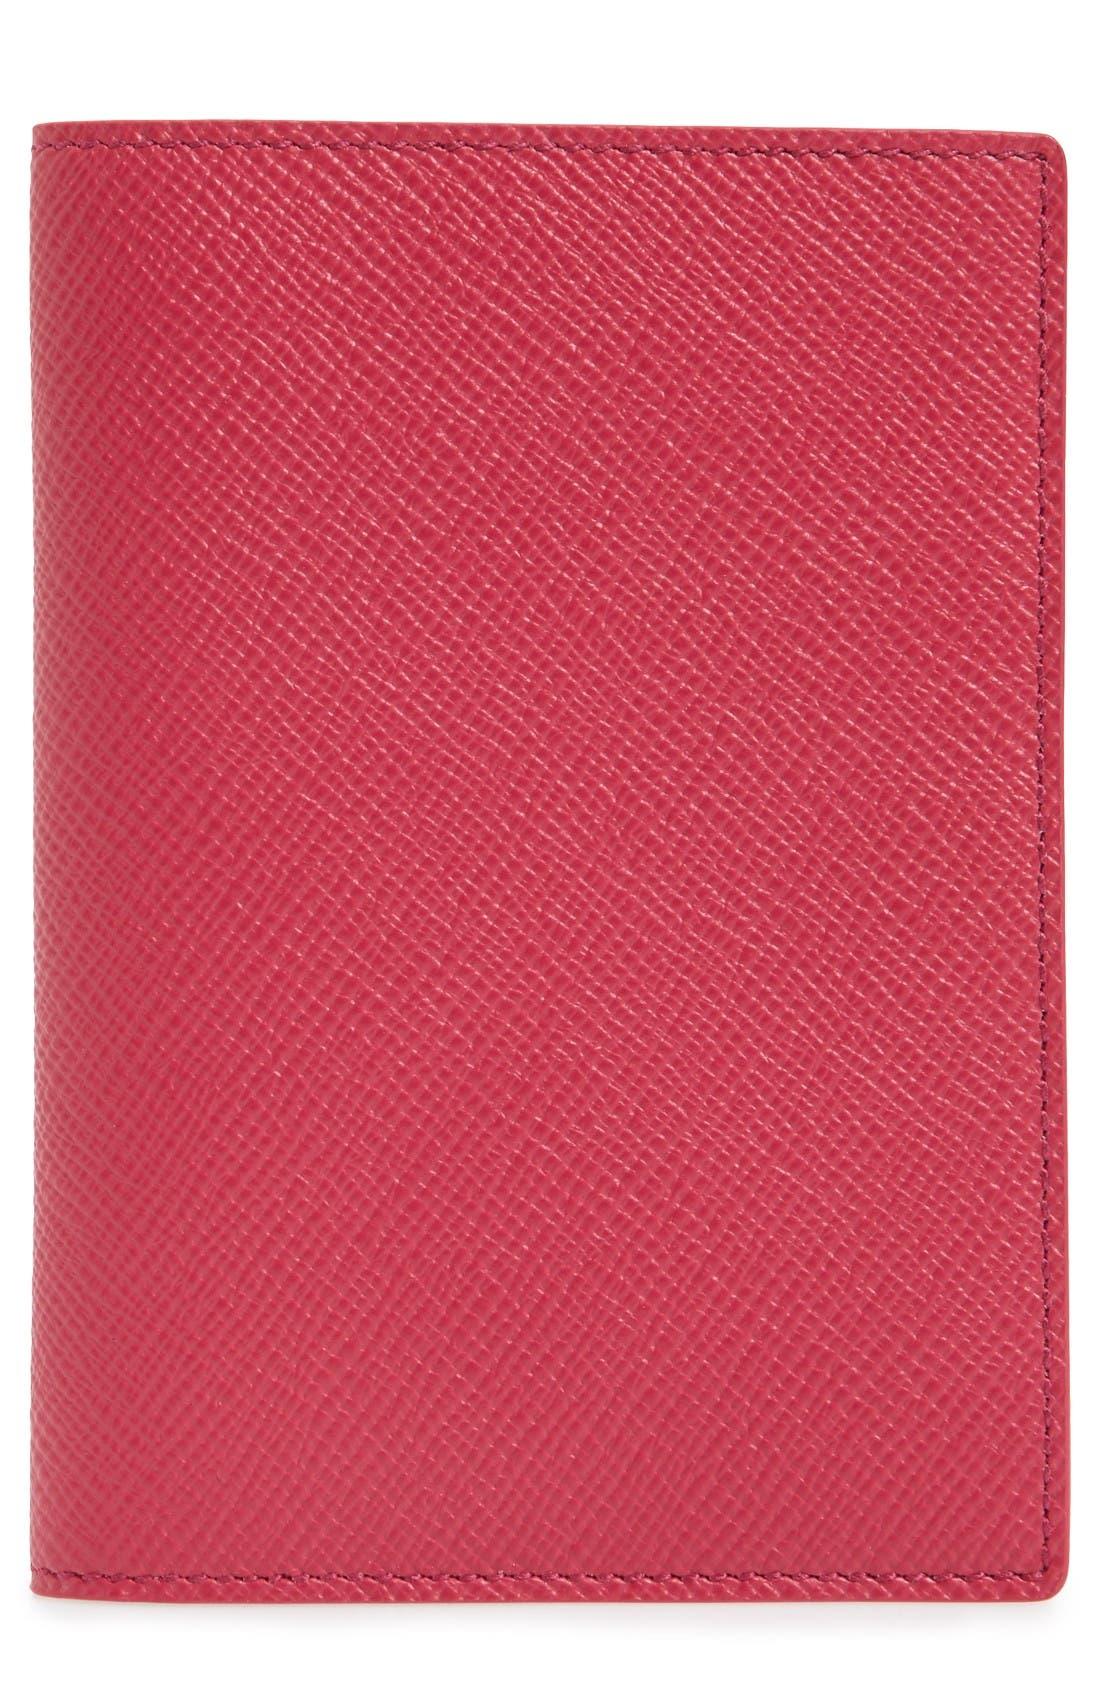 SMYTHSON Panama Calfskin Leather Passport Holder